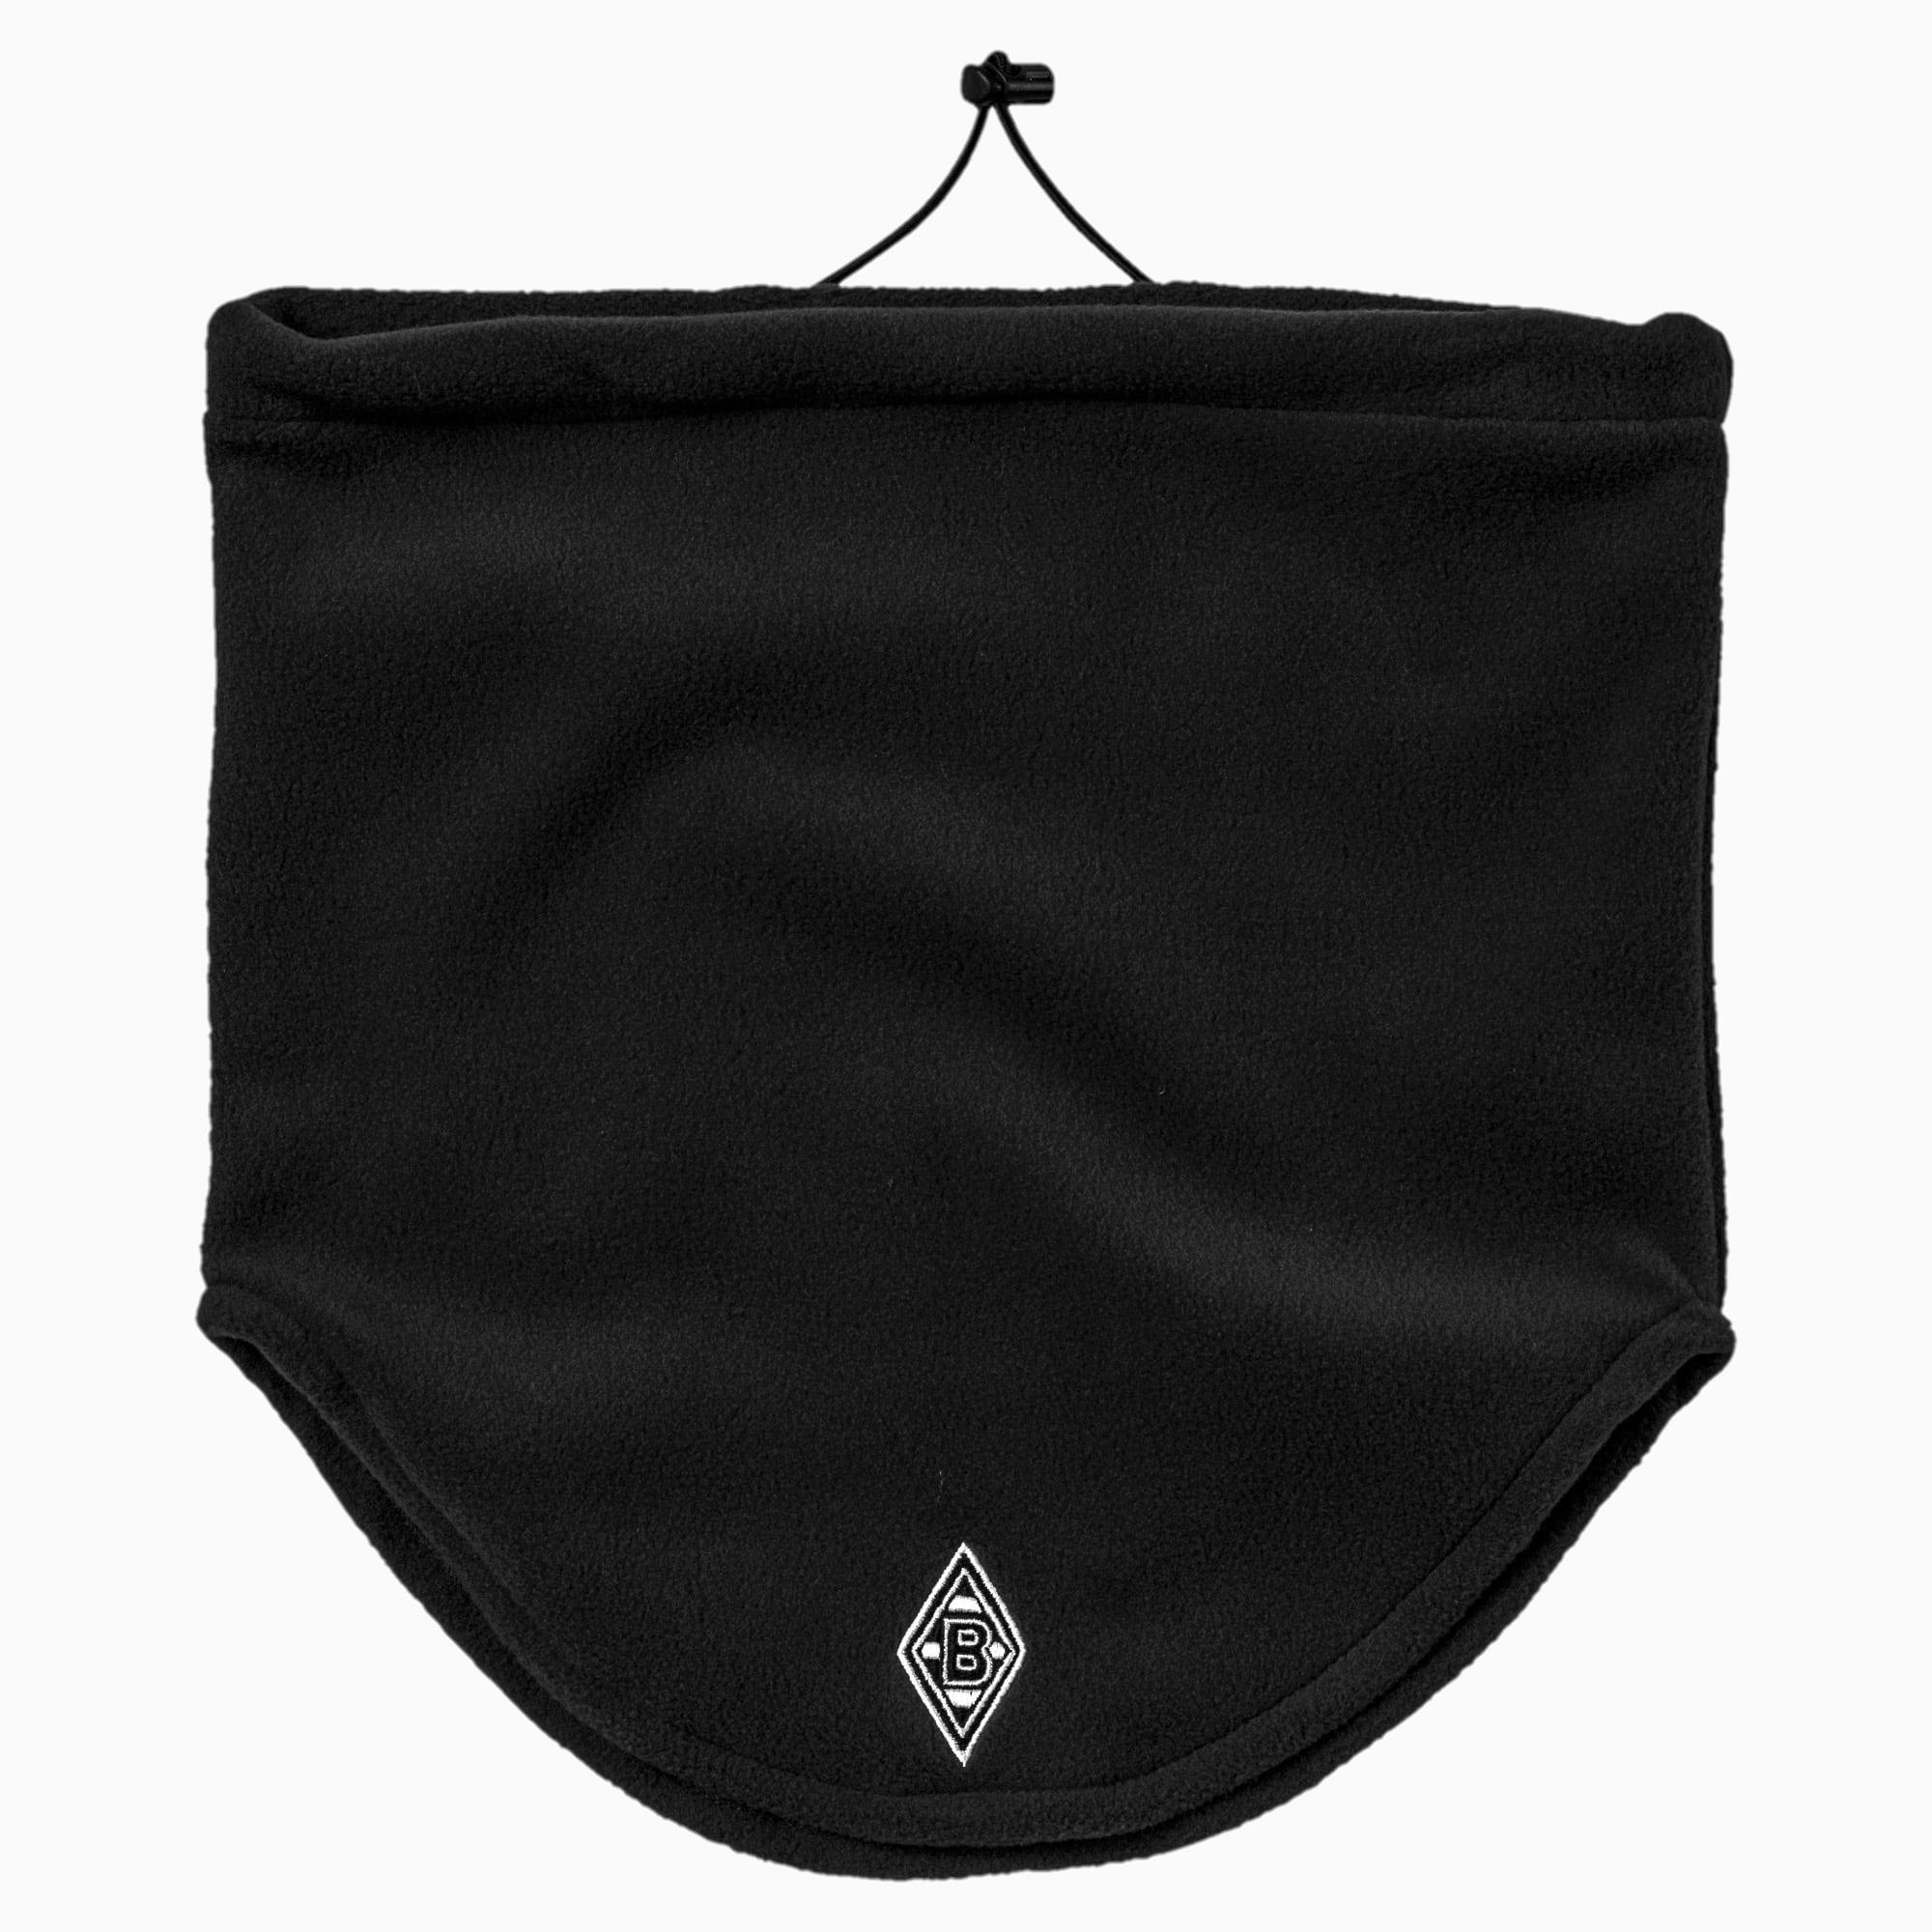 Écharpe borussia mönchengladbach, noir, vêtements